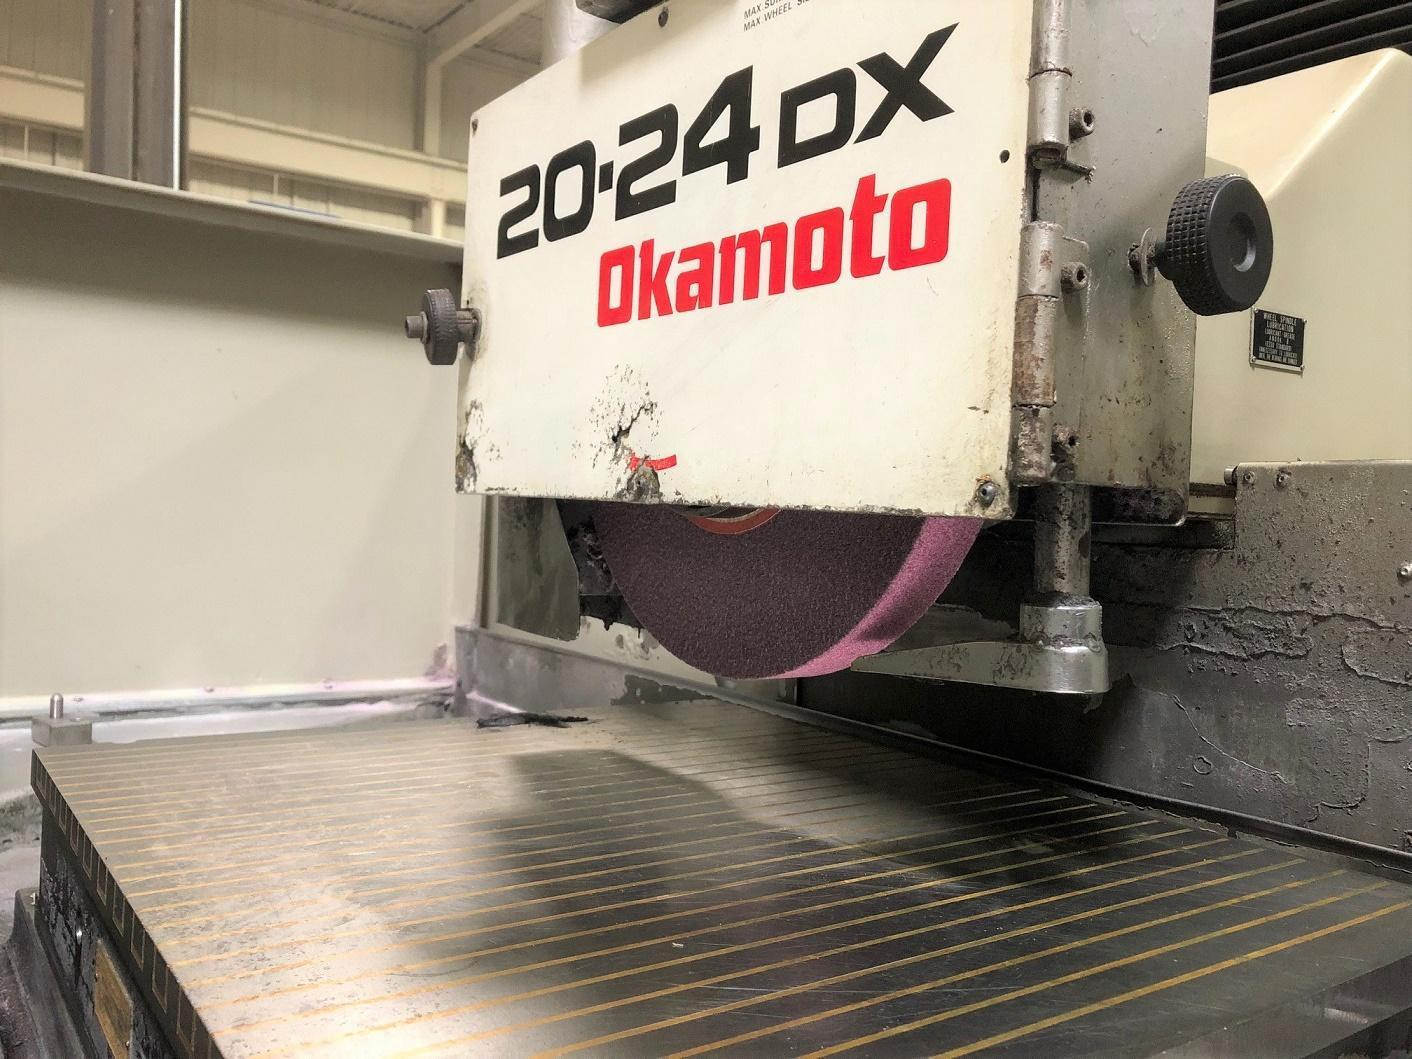 Okamoto ACC 20-24DX Surface Grinder